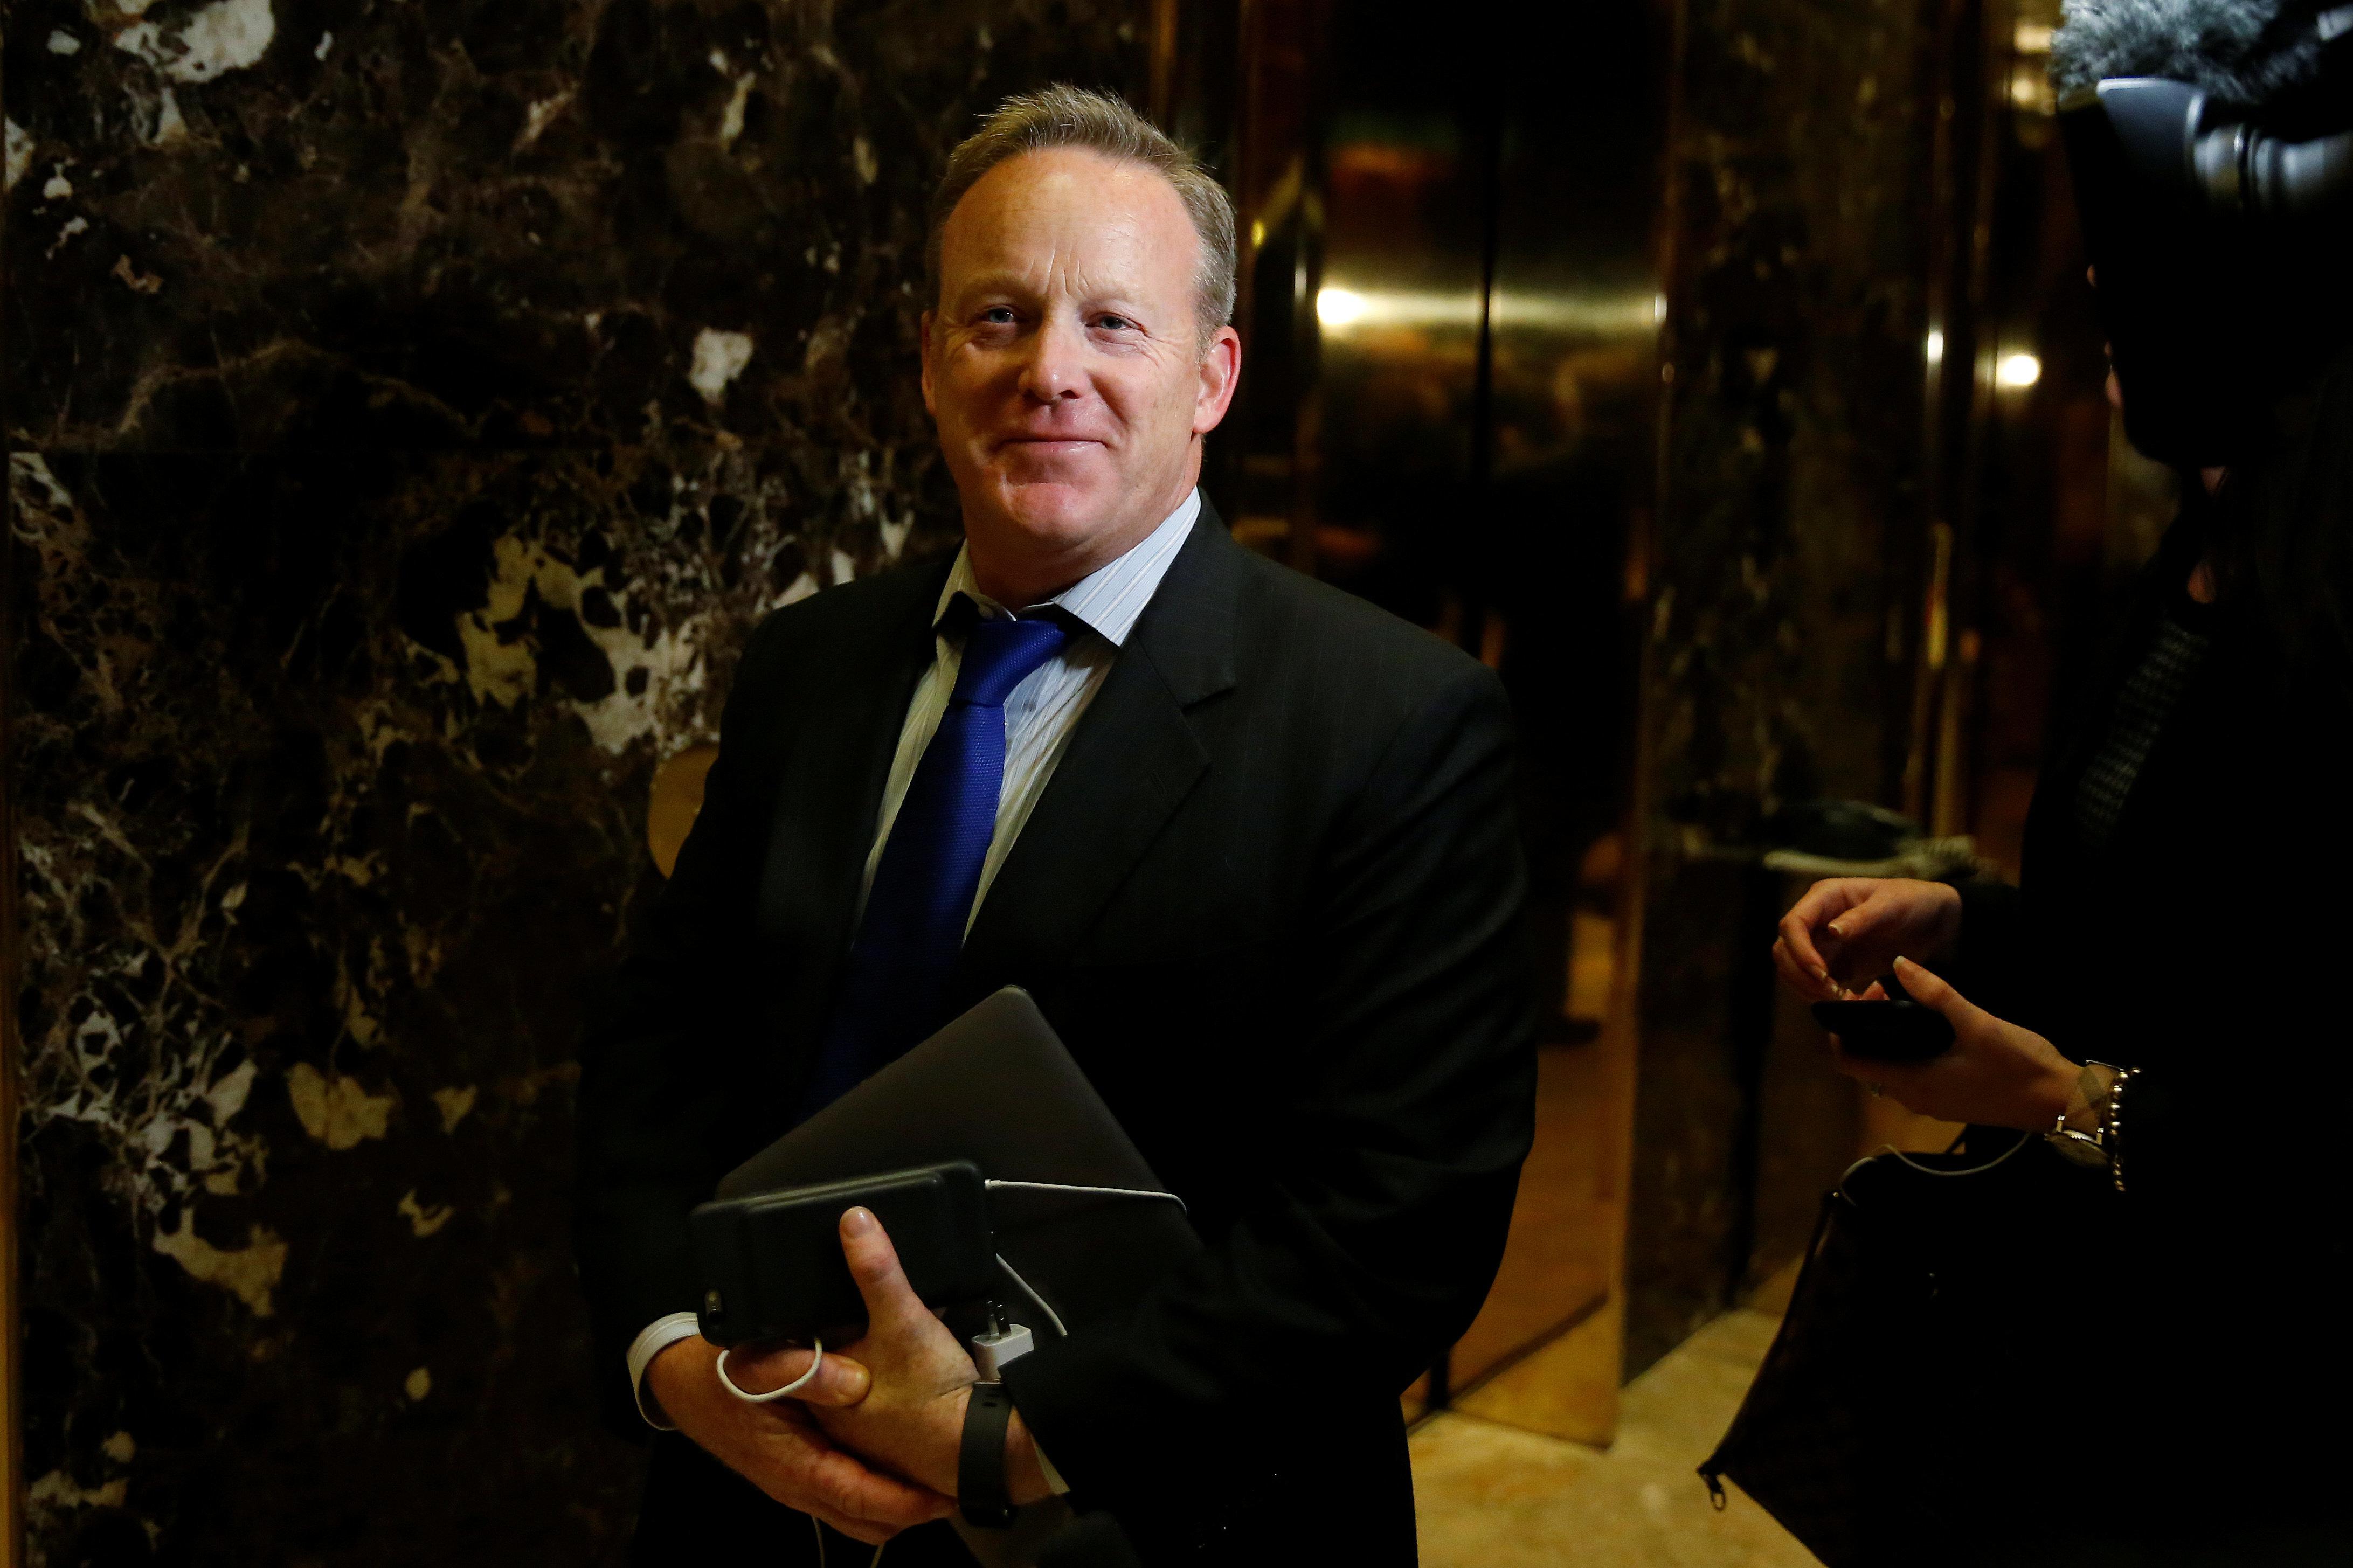 Veteran GOP Spokesman Sean Spicer Named White House Press